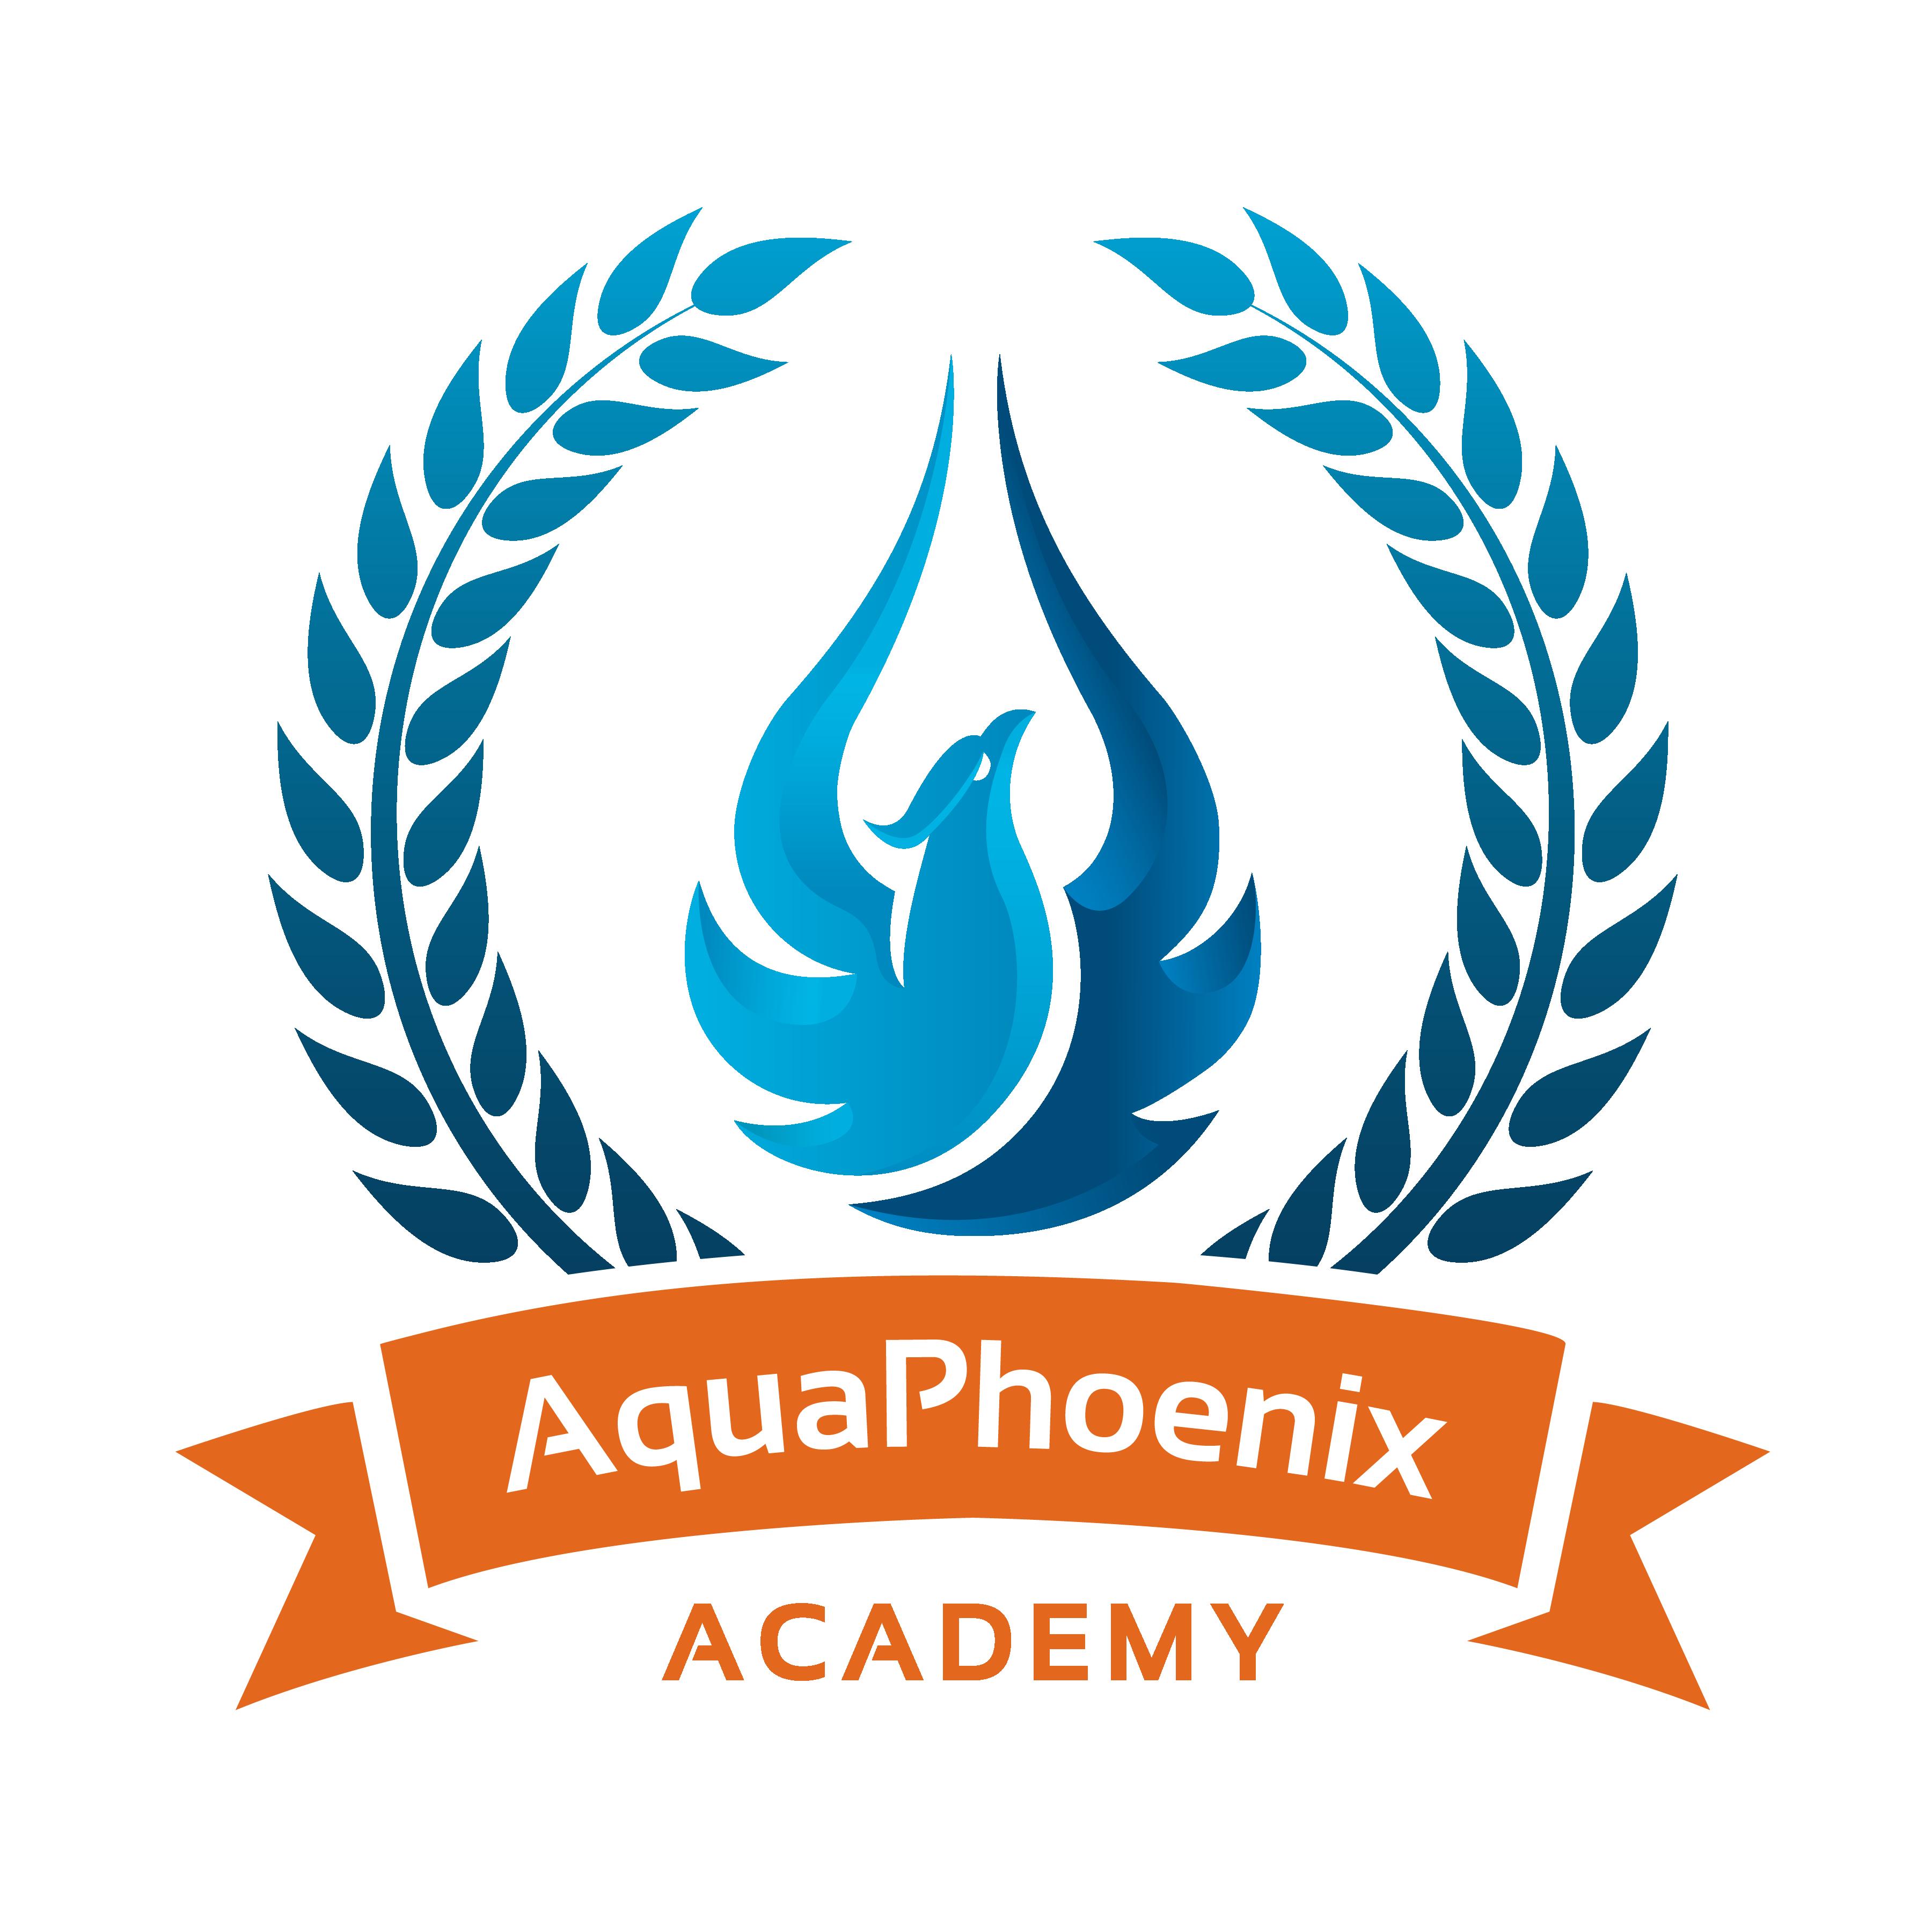 AquaPhoenix Academy.png